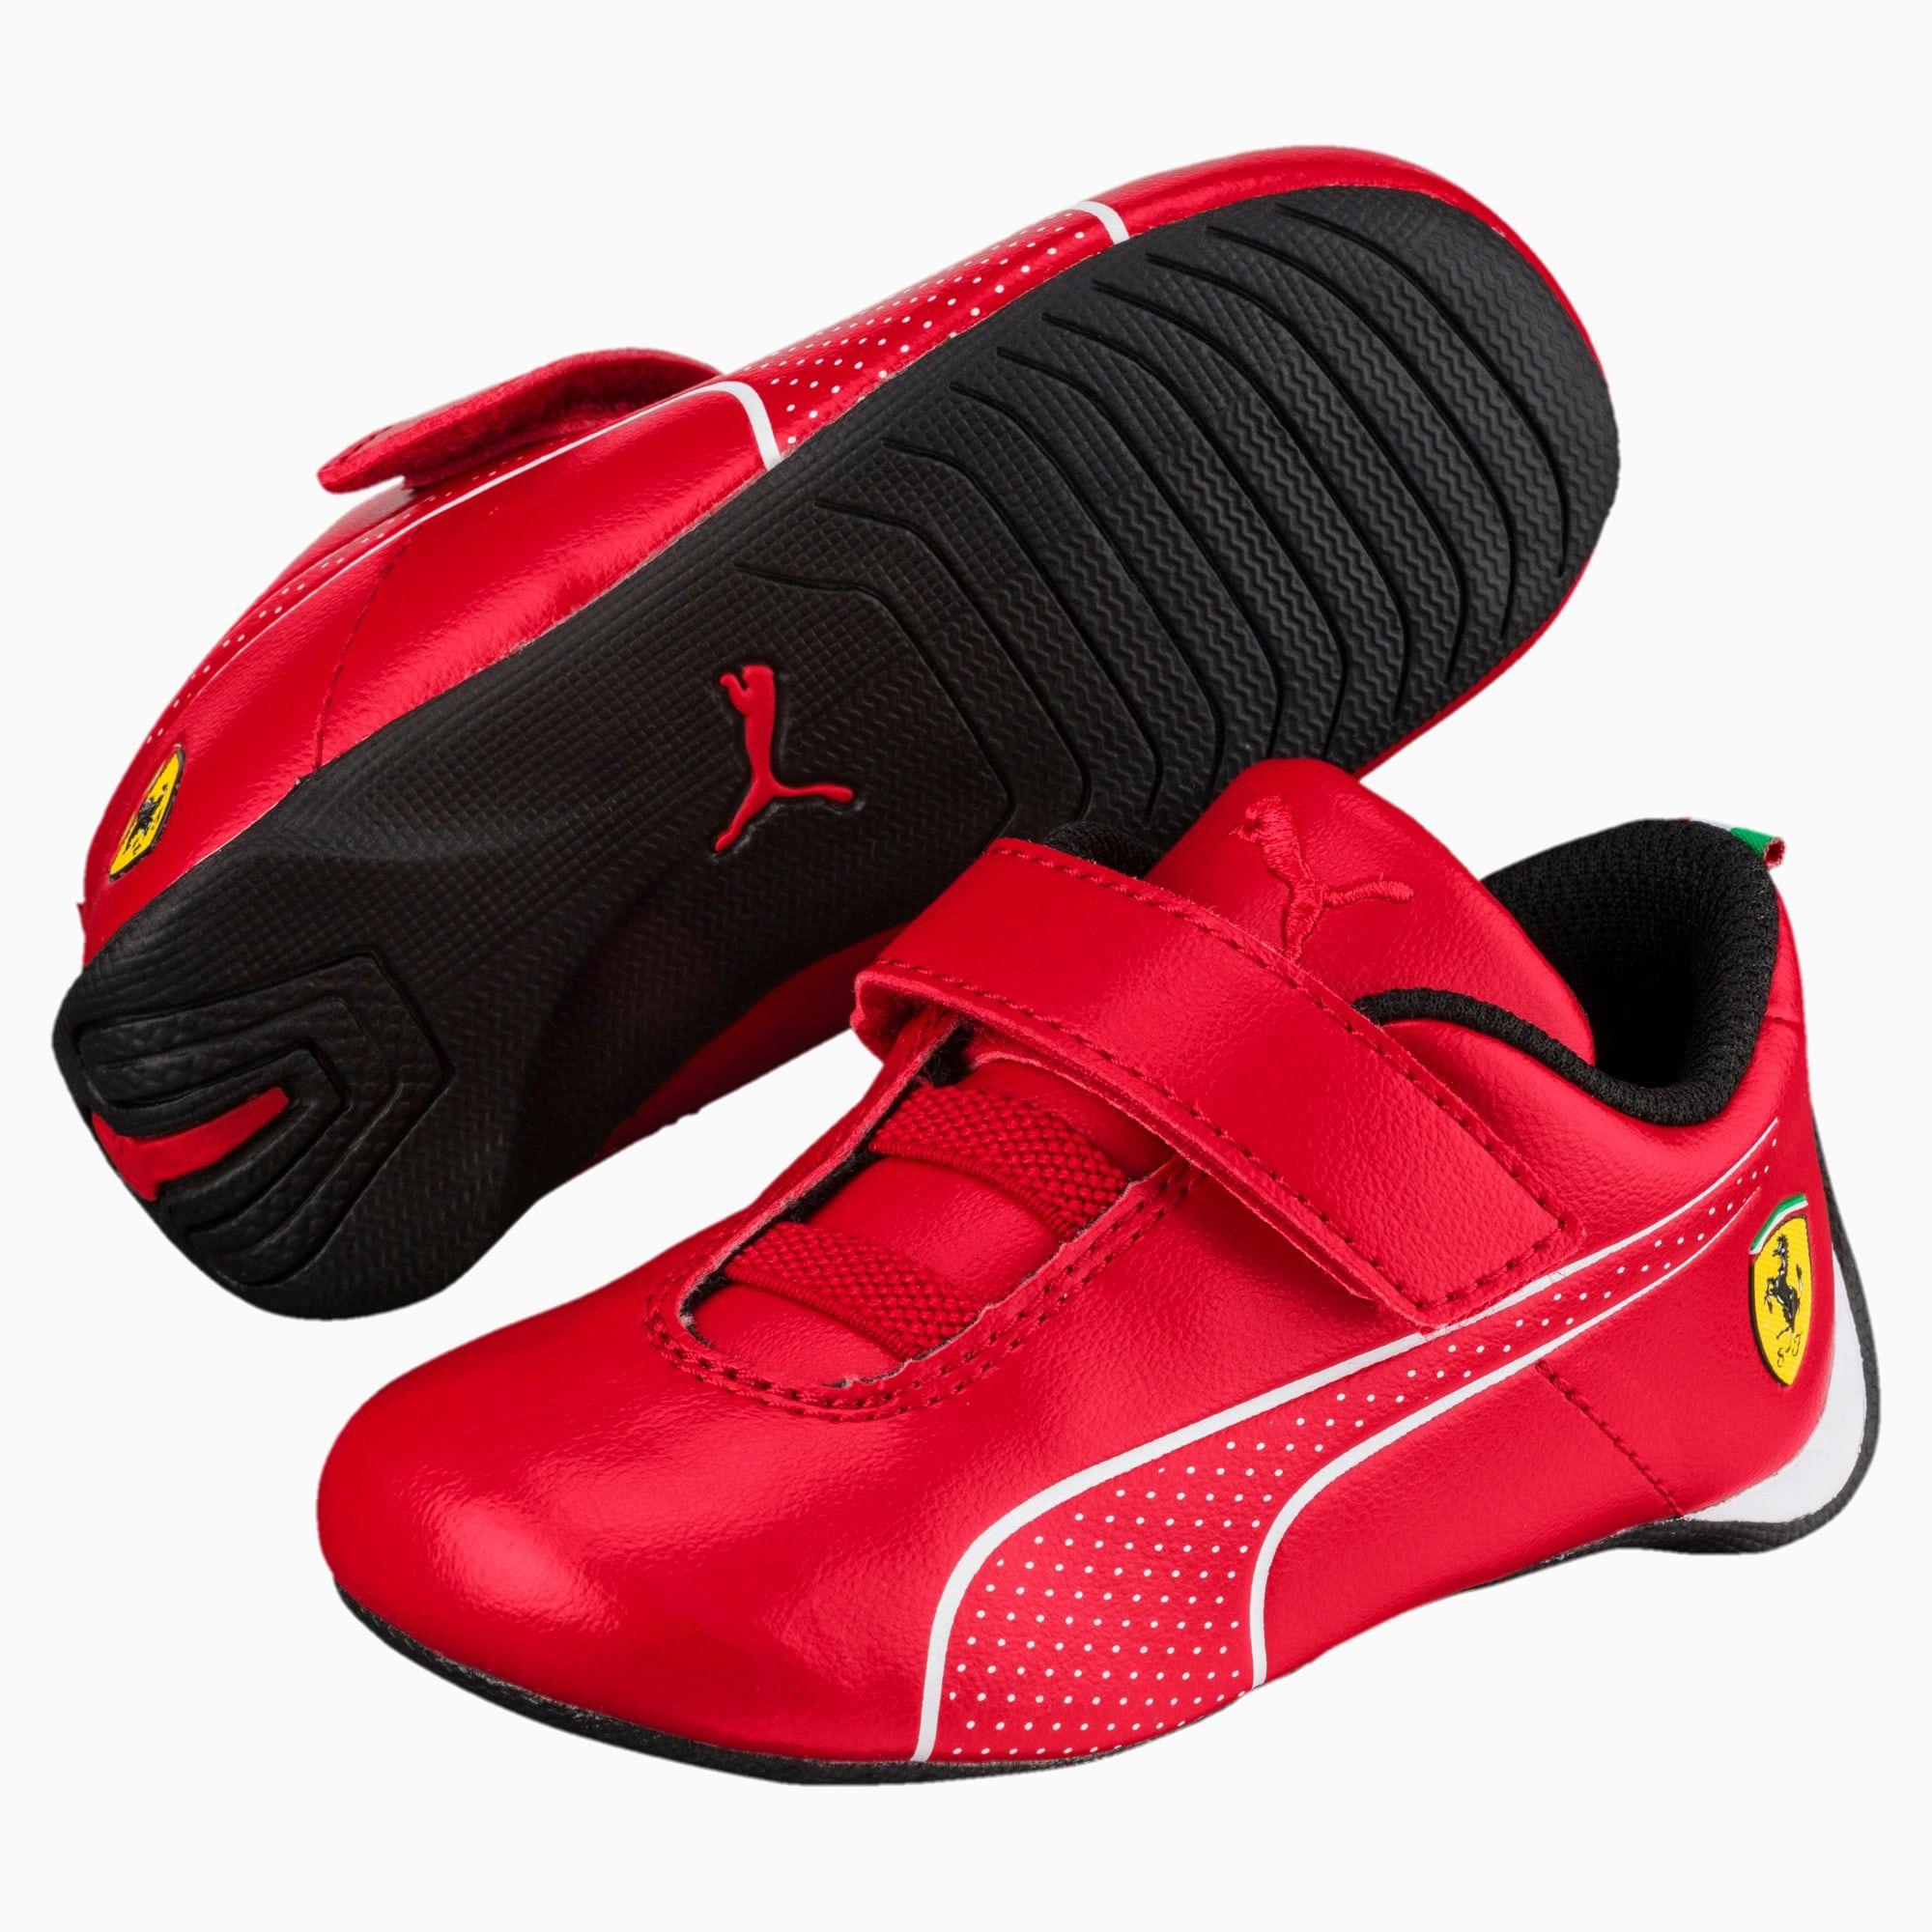 PUMA SF Future Cat Ultra V Preschool Shoe Sneakers, Red, size 13, Shoes